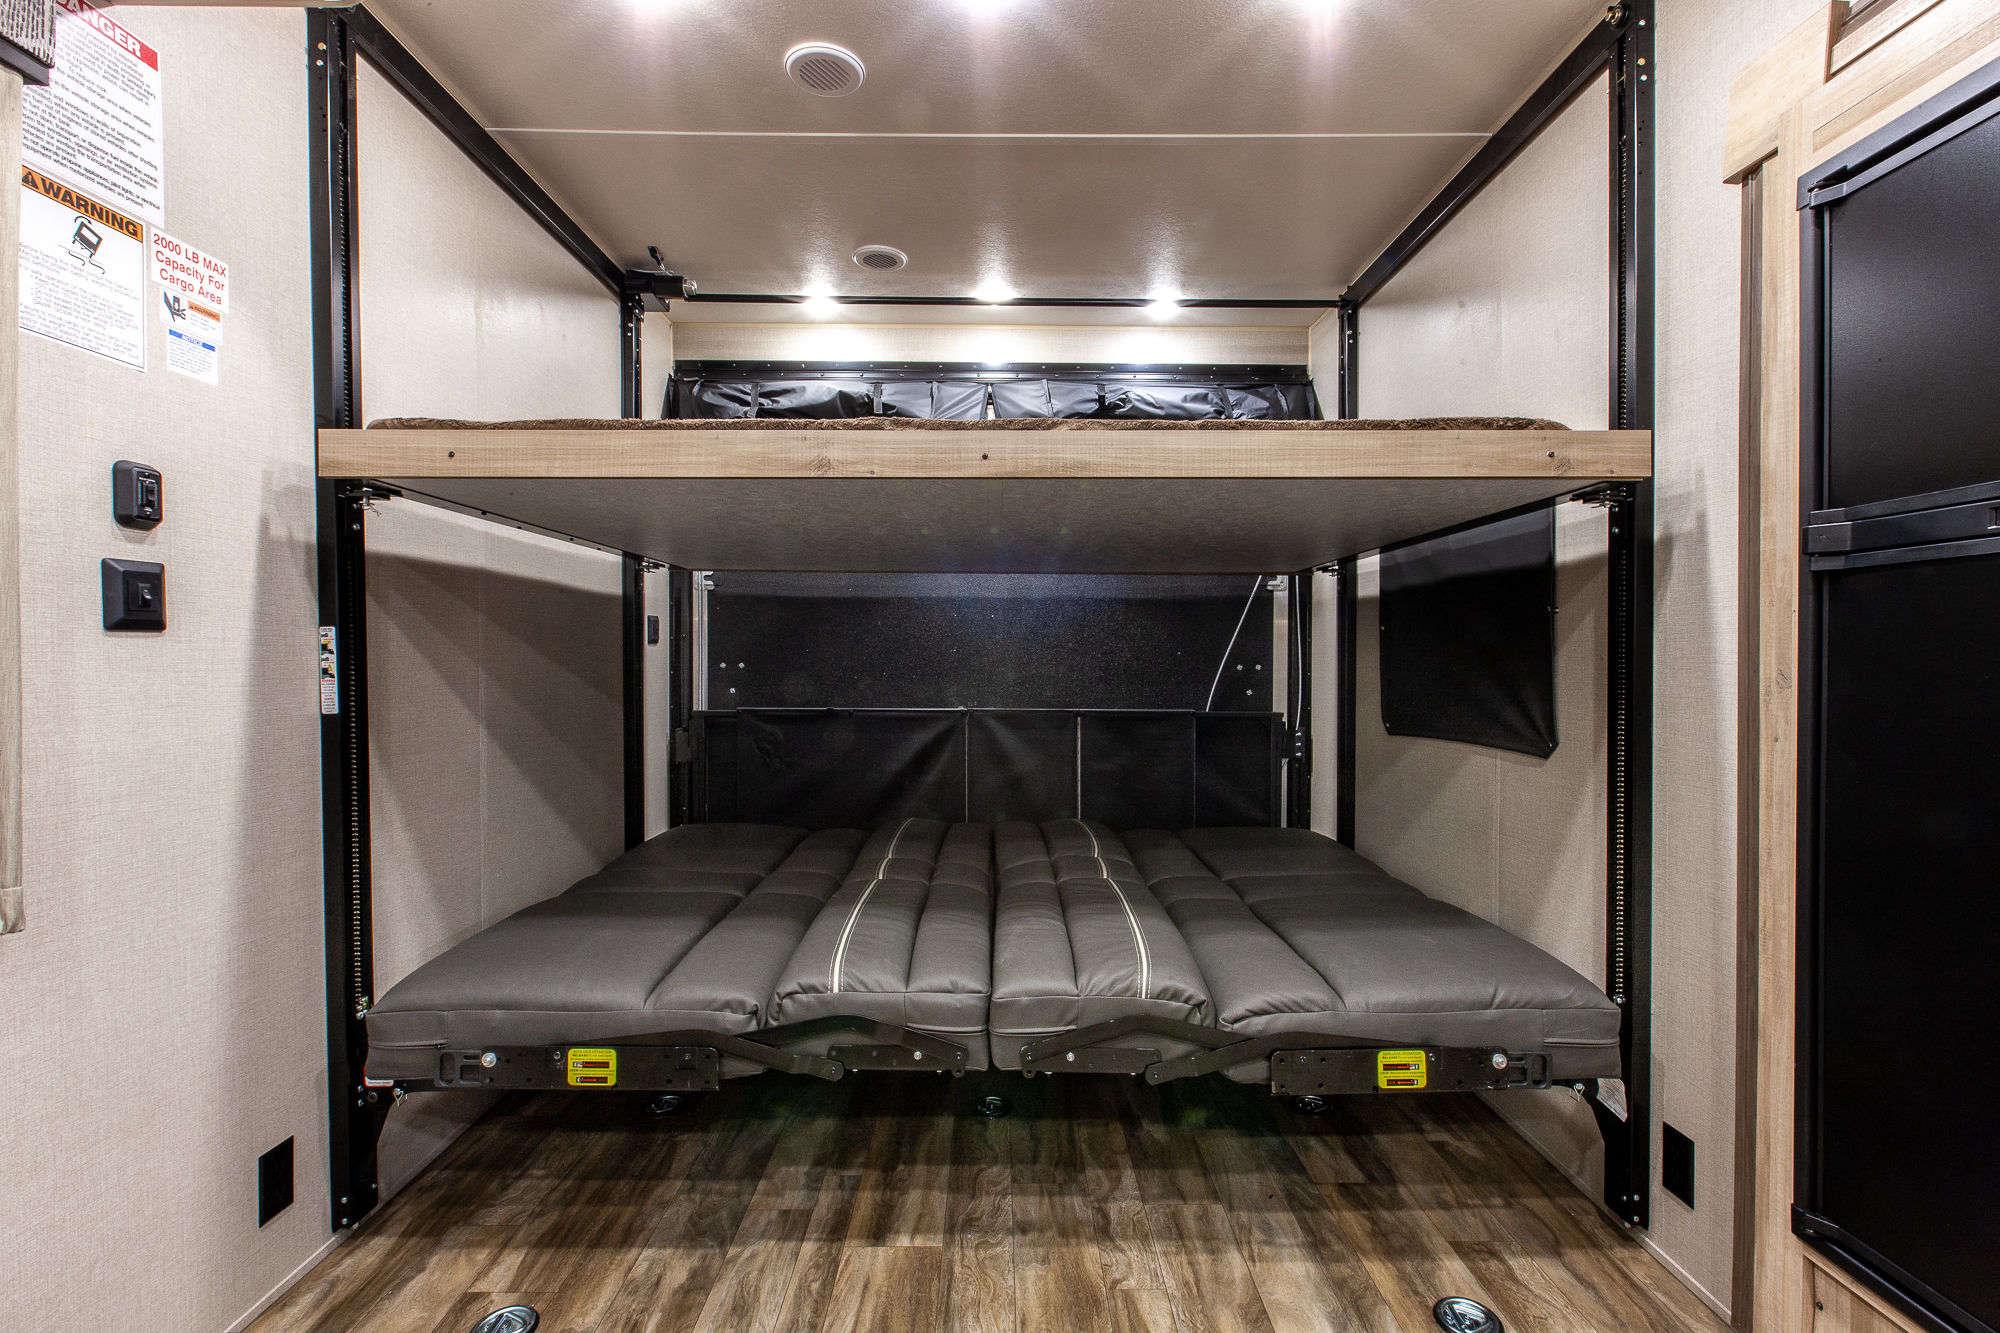 2021 Coachmen Catalina Trail Blazer 28THS Bunkhouse Toy Hauler Travel Trailer Interior Image